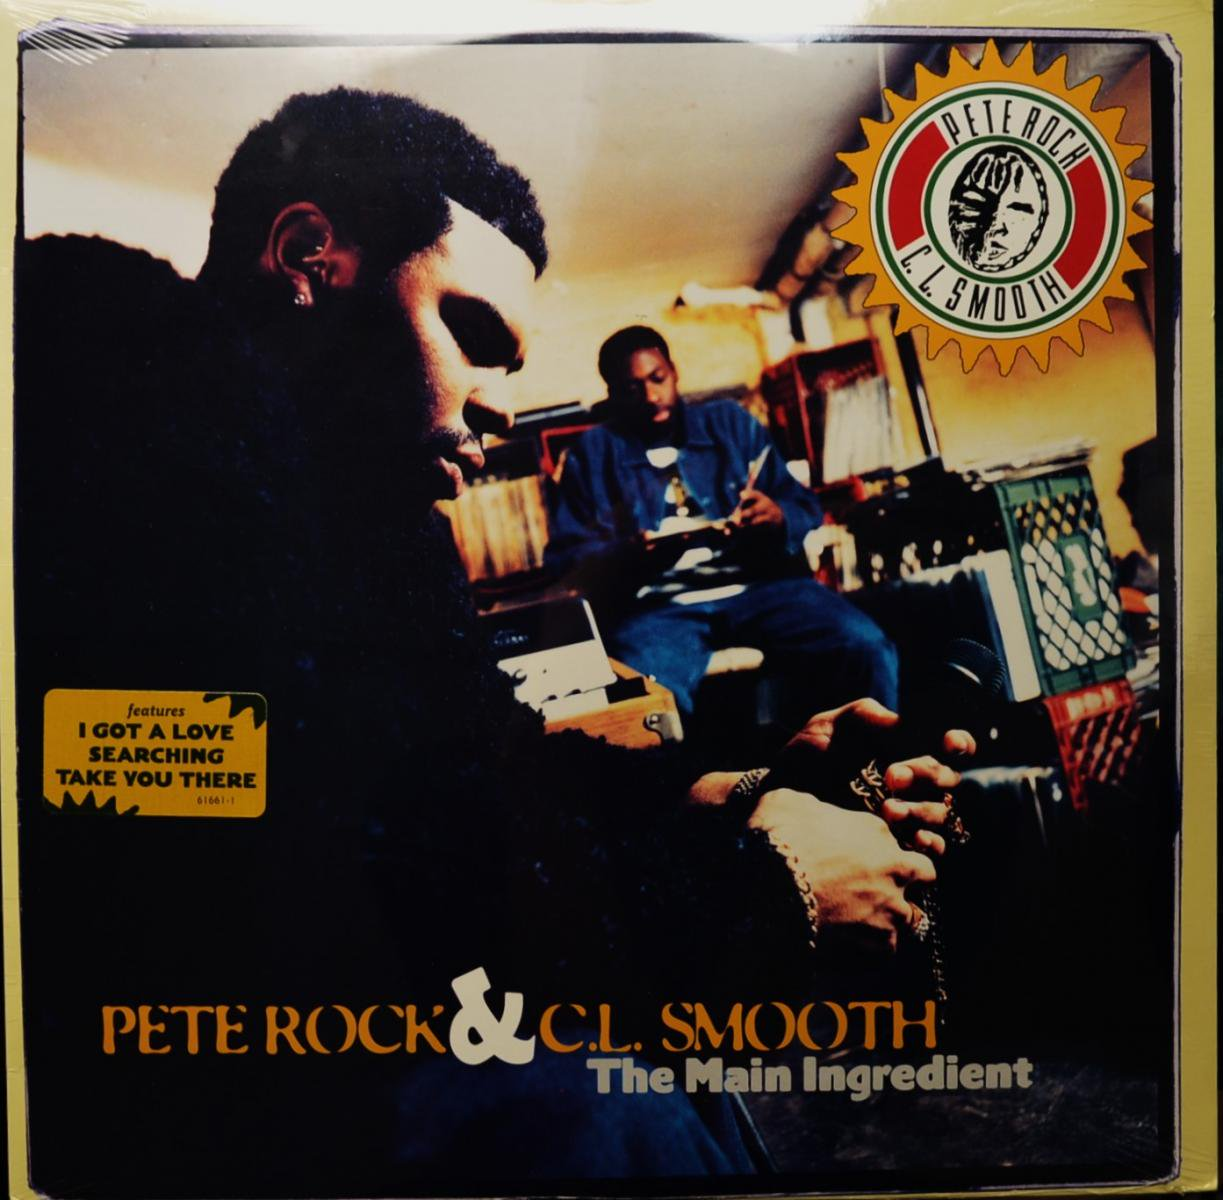 PETE ROCK & C.L.SMOOTH / THE MAIN INGREDIENT (LP)